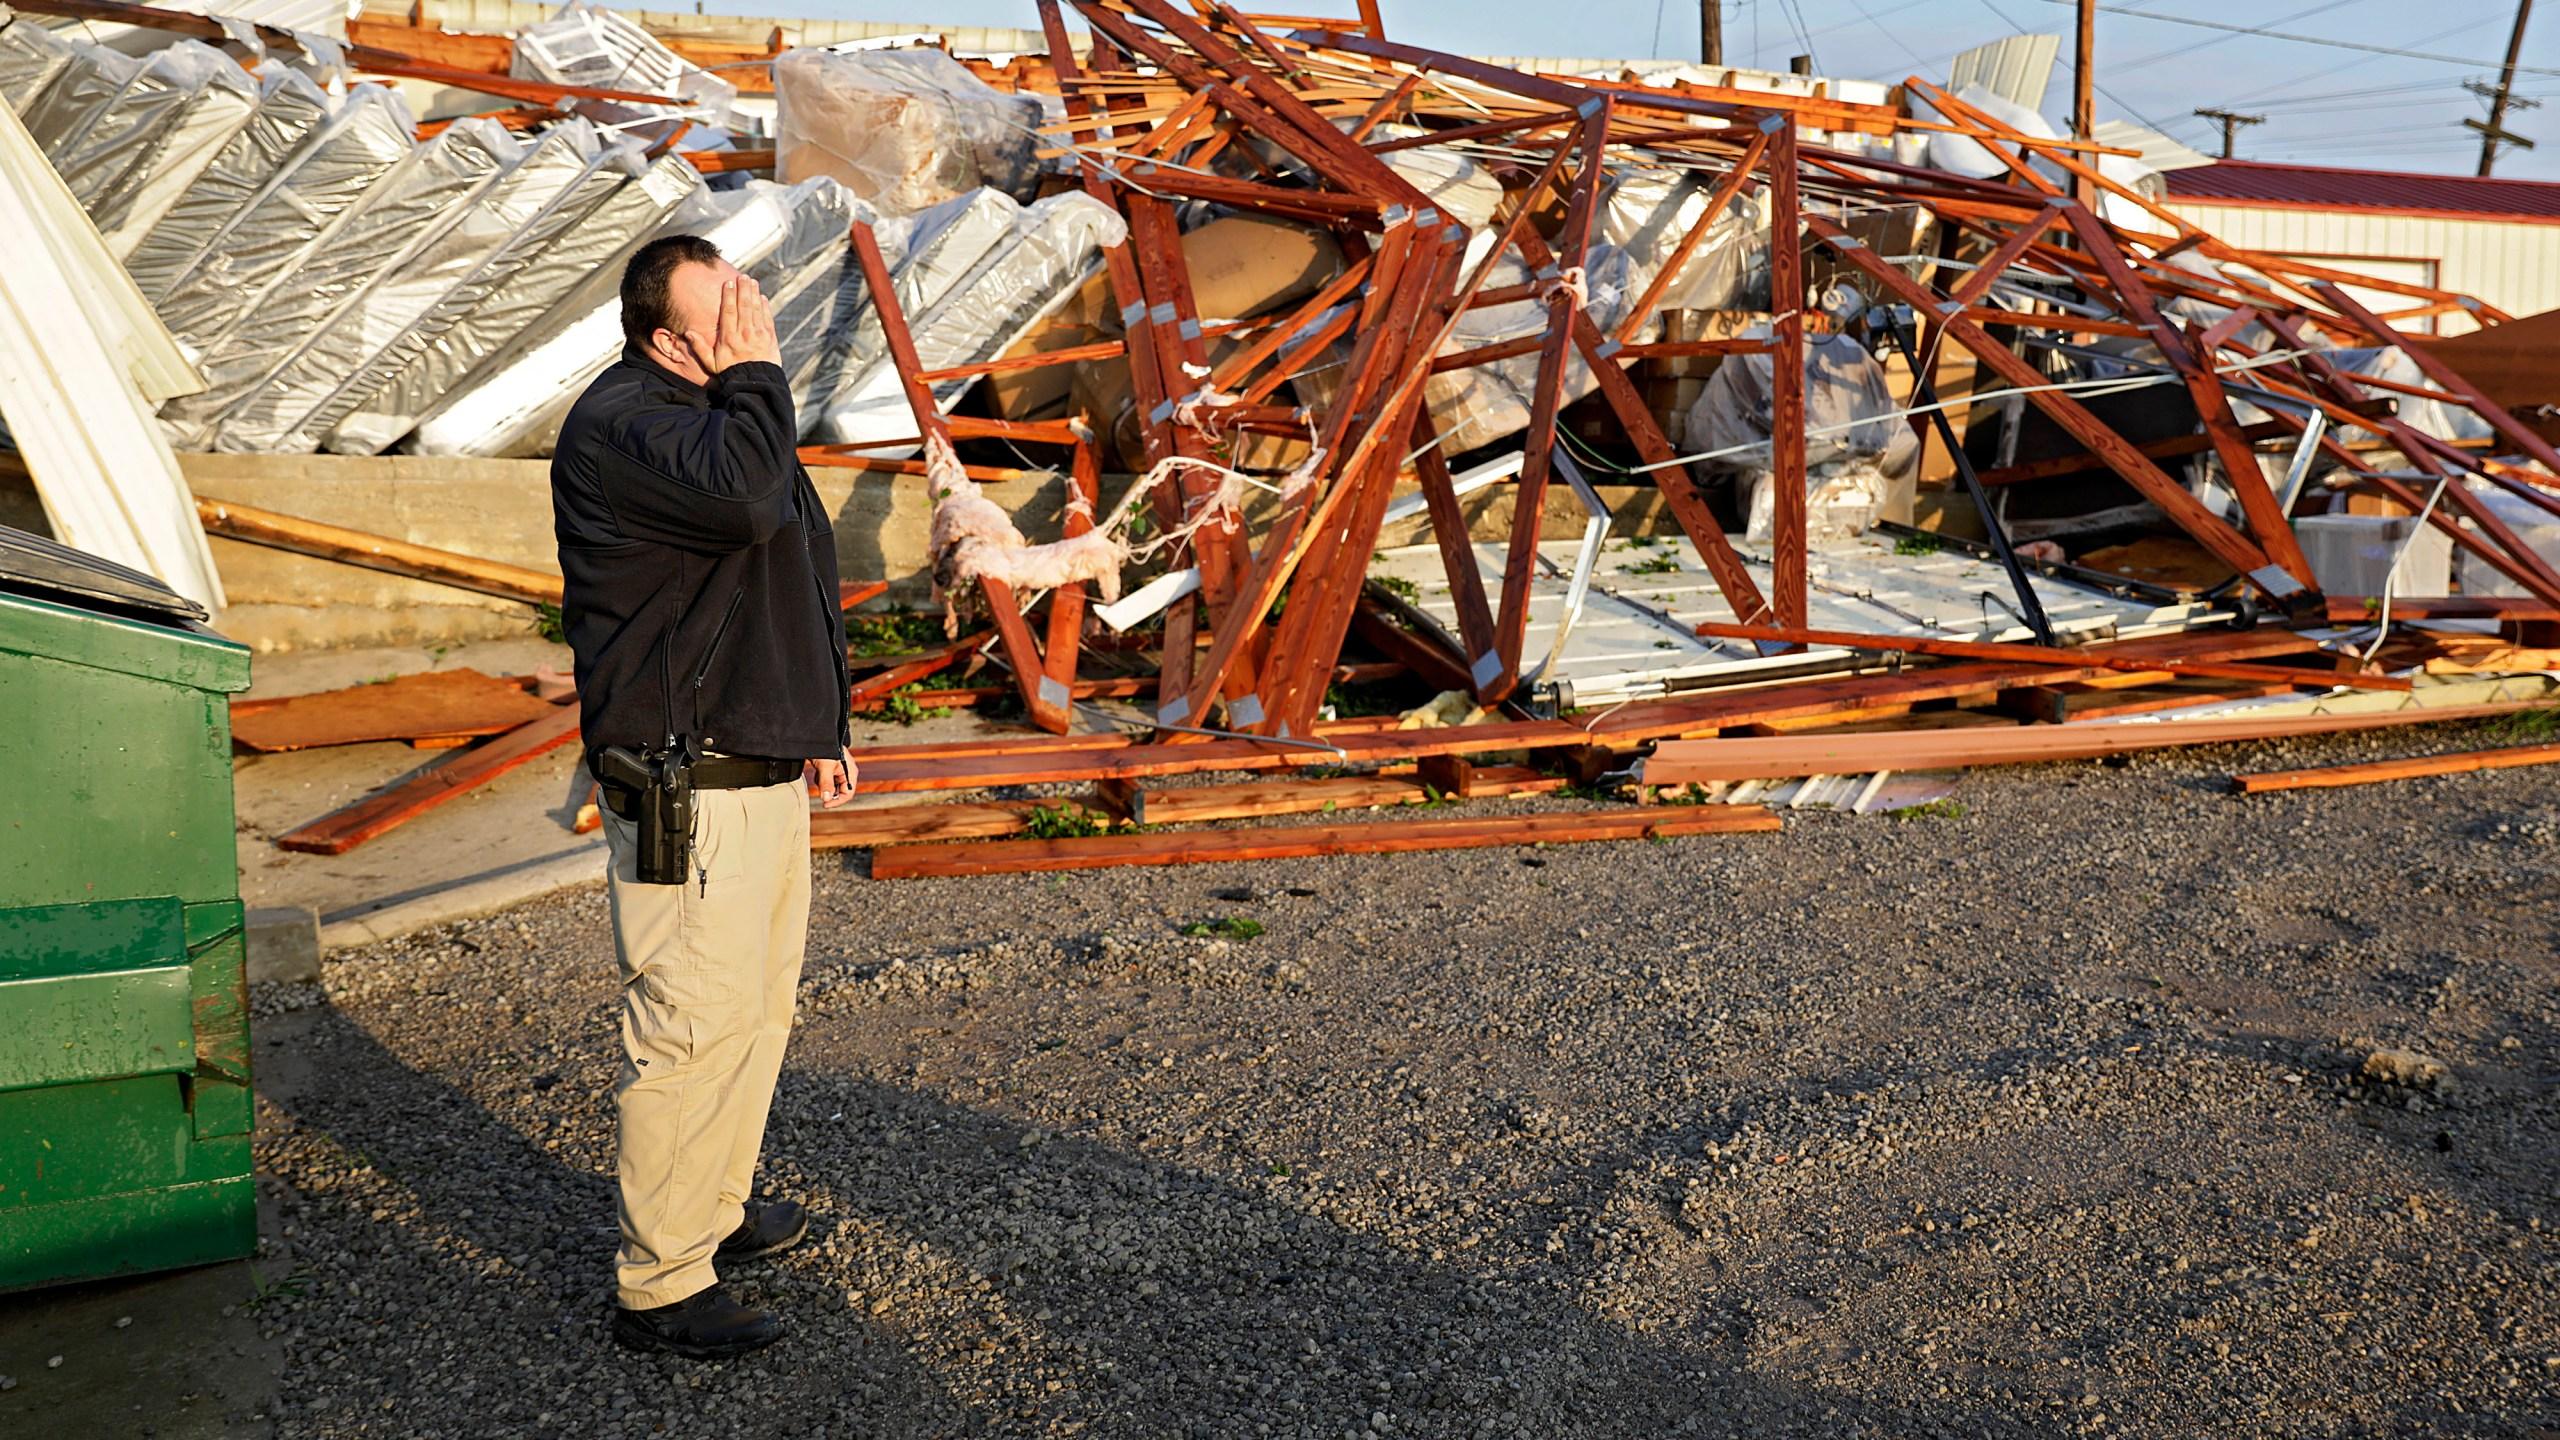 Severe_Weather_Oklahoma_85800-159532.jpg40320587